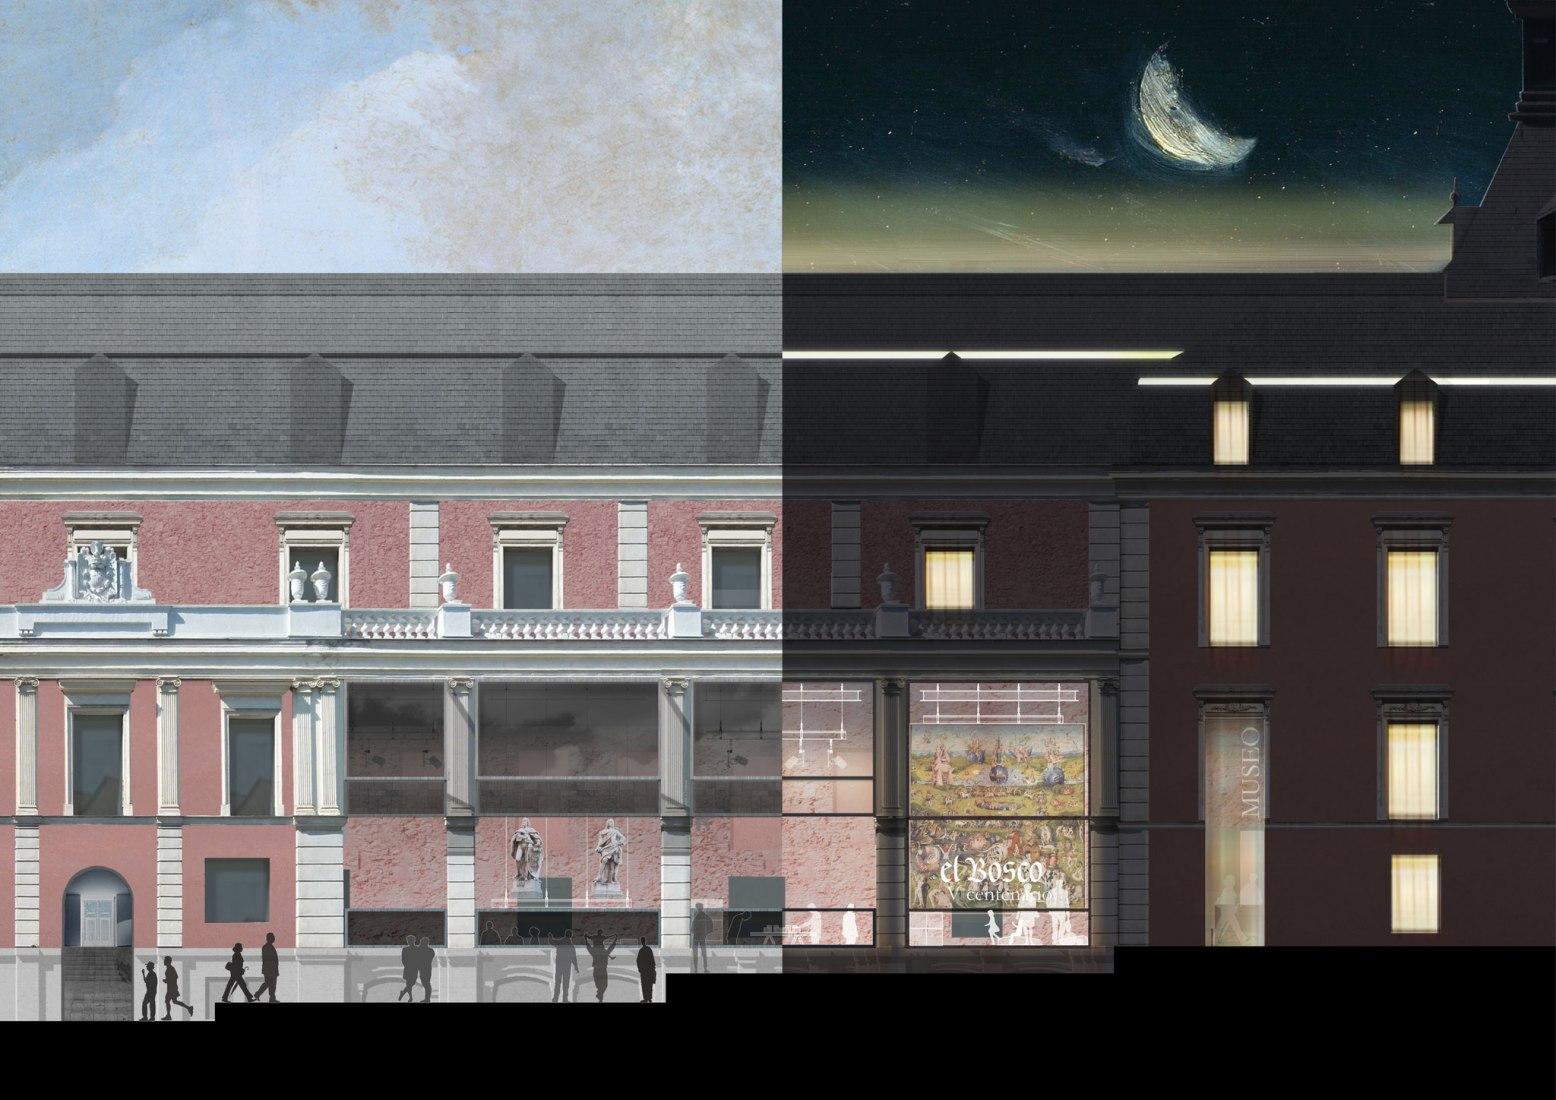 Night and day. El Prado Extension, by OMA and Linazasoro & Sánchez. Image courtesy of OMA.